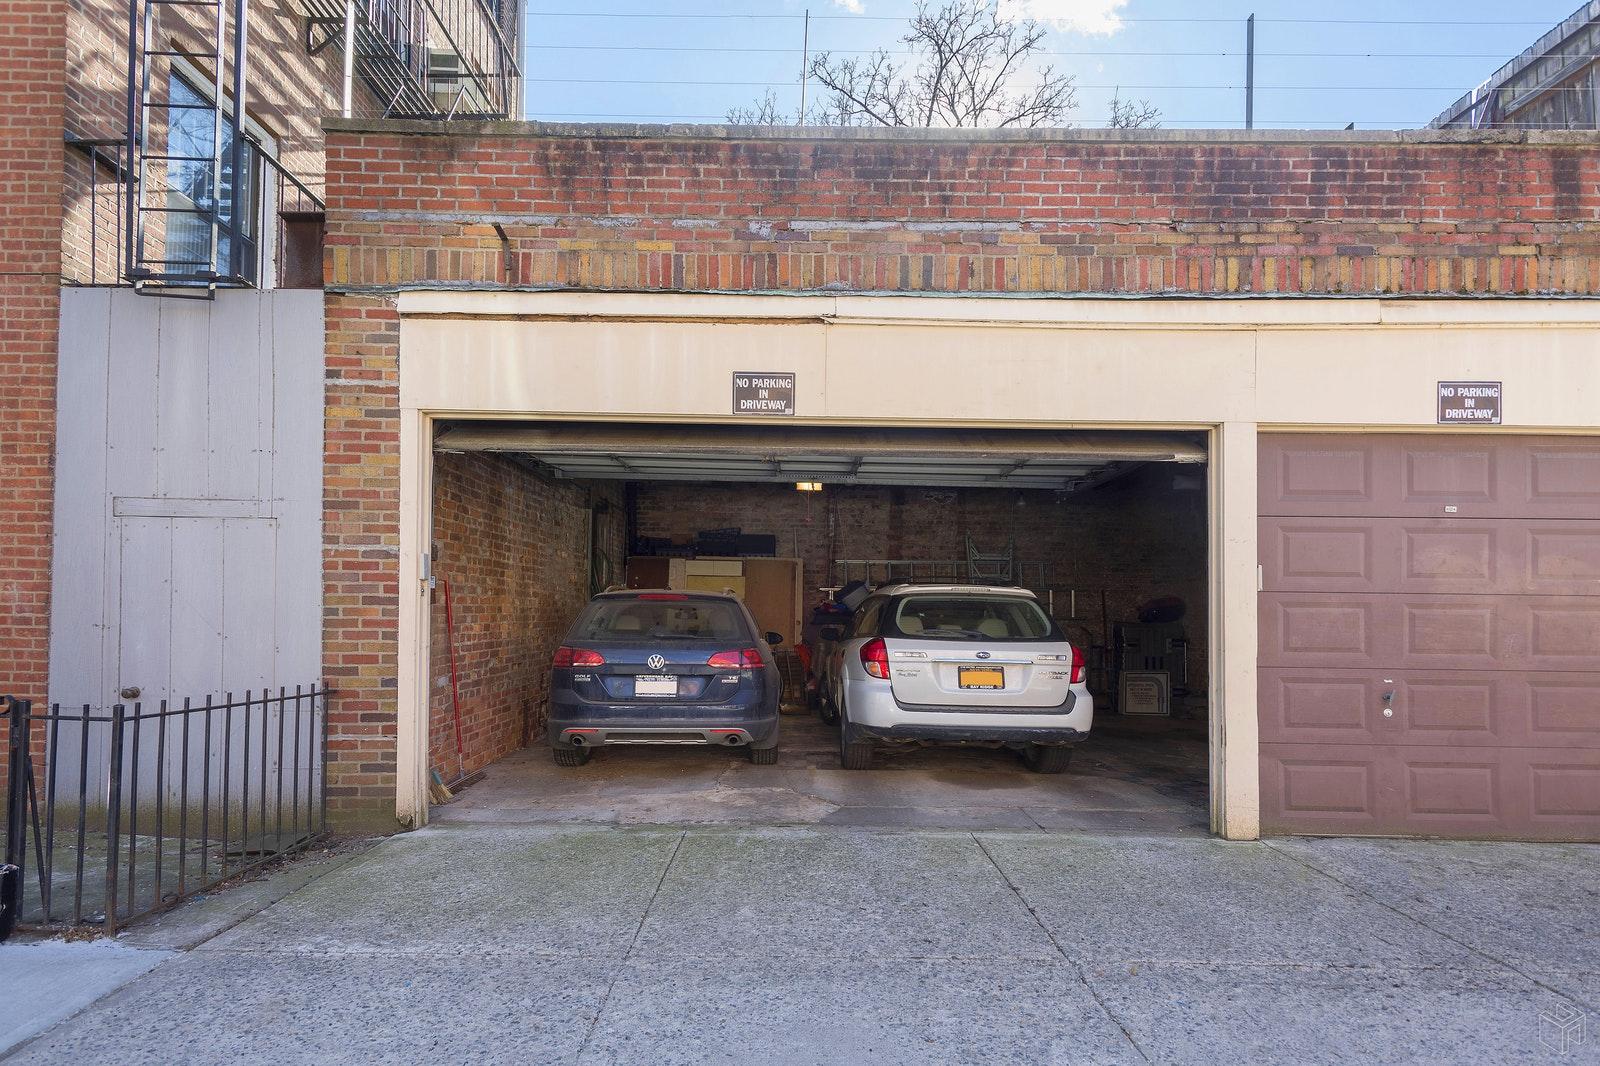 110 HOYT STREET 1, Boerum Hill, $995,000, Web #: 19327105